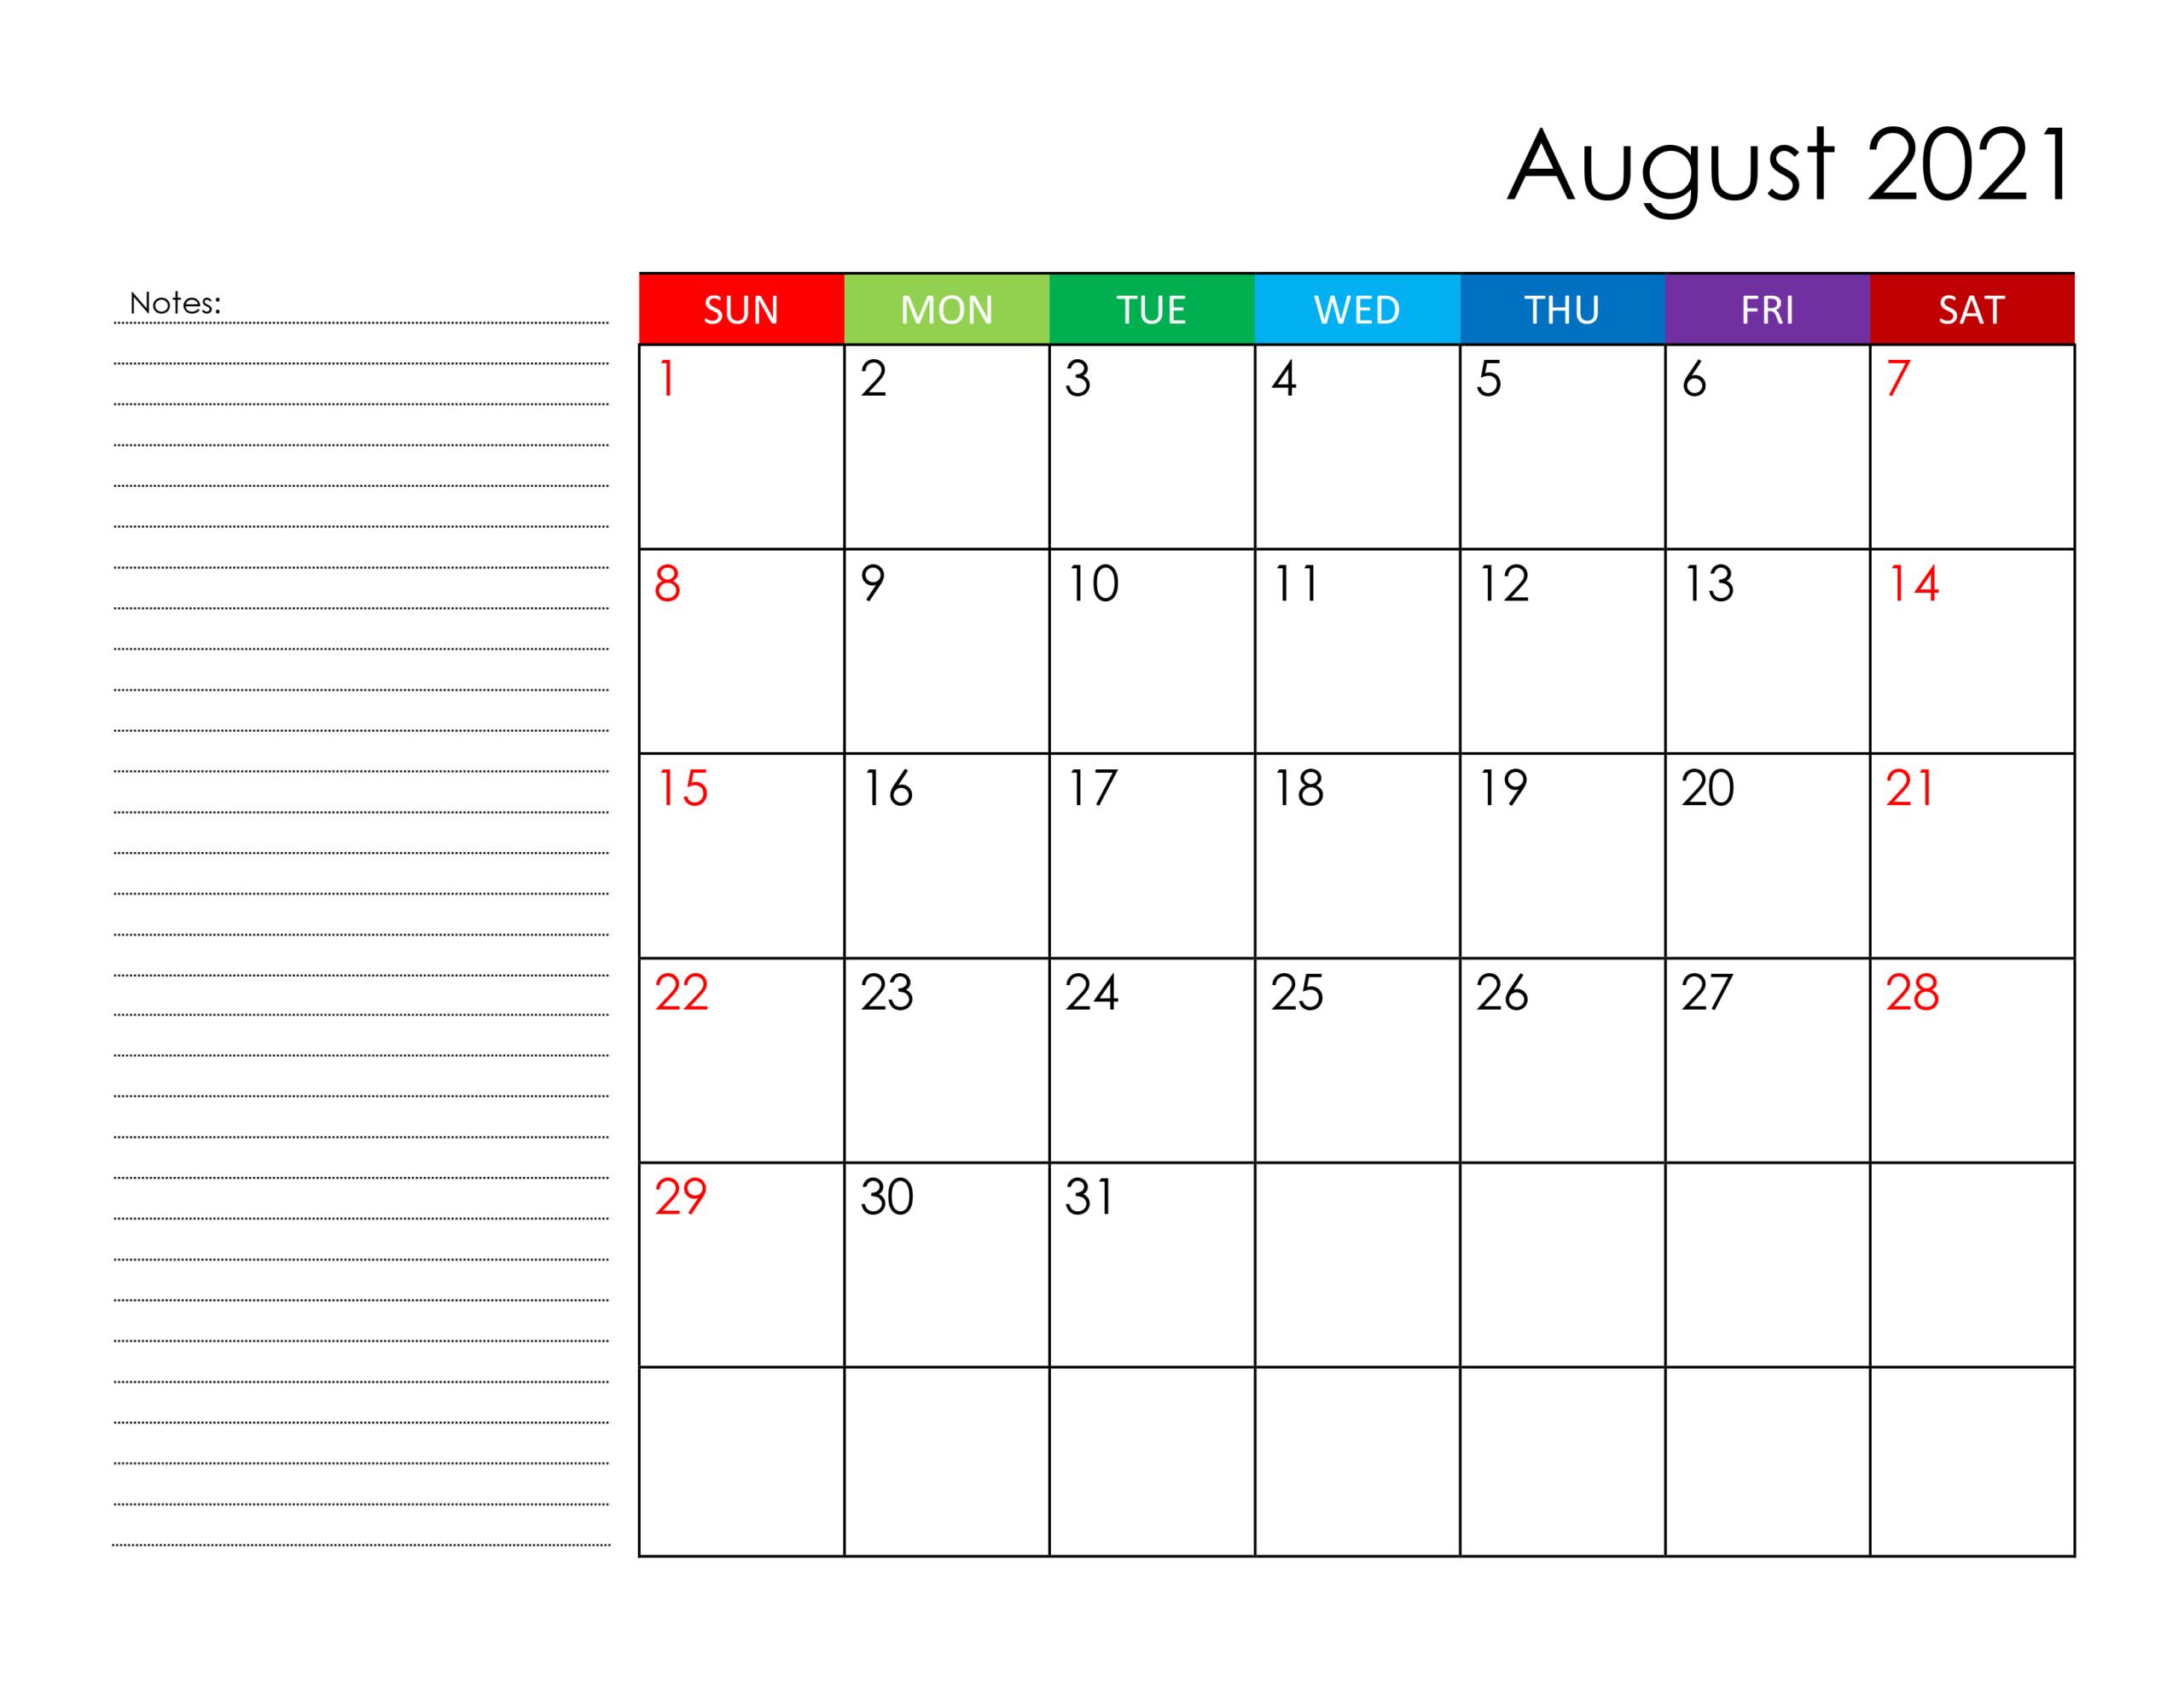 Calendar For August 2021  Freecalendar.su regarding Free Calendars 2021 Word Doc Printable August